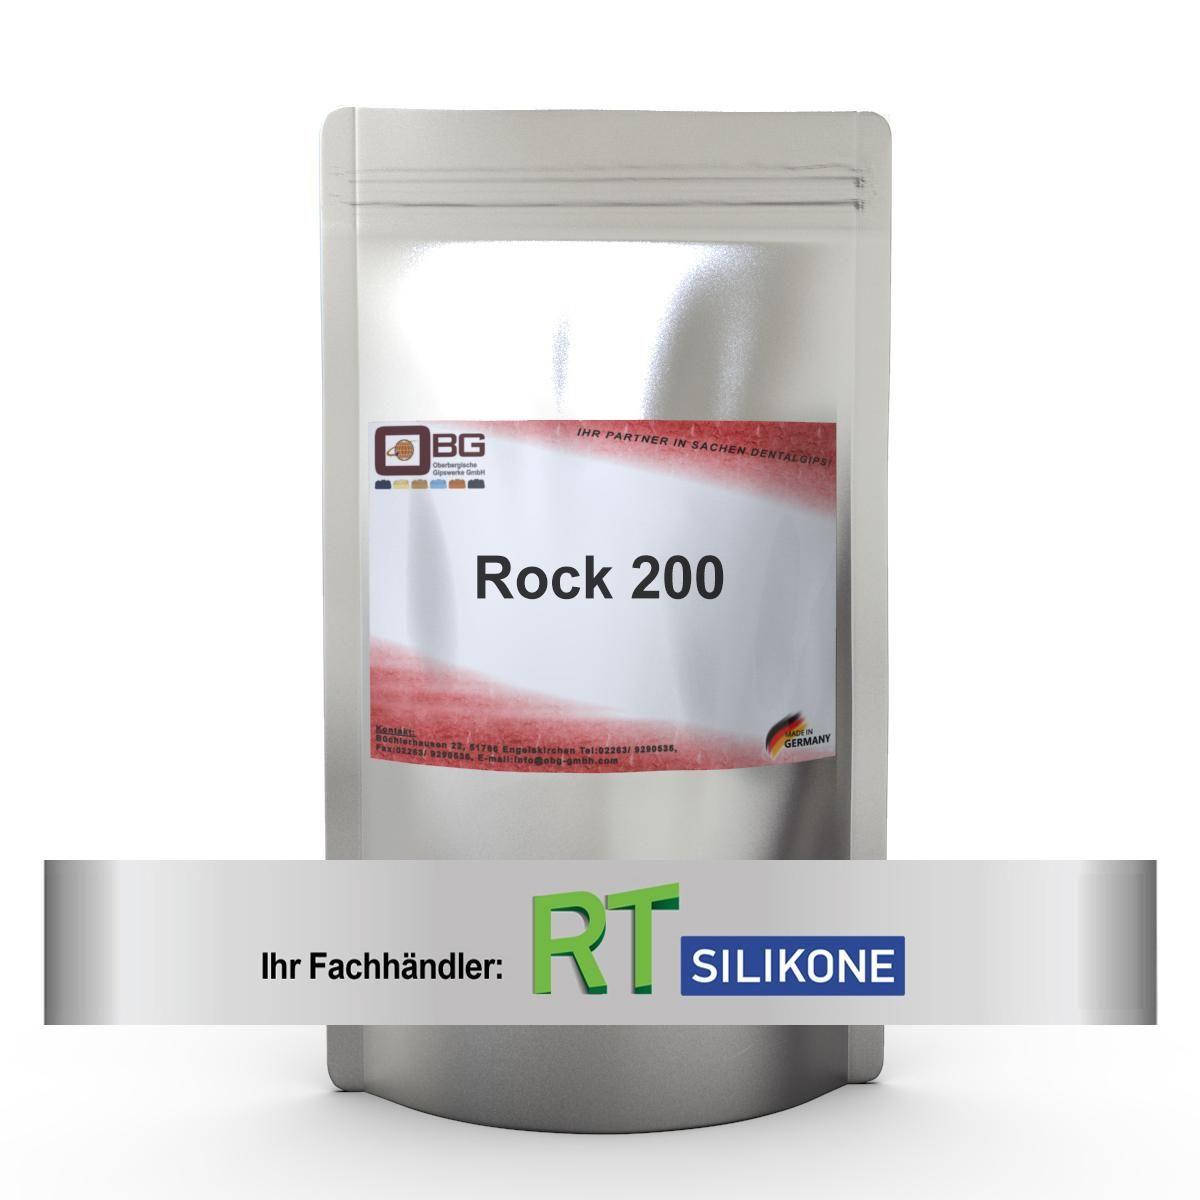 Rock 200 Zahnkranzgips apricot 5:1